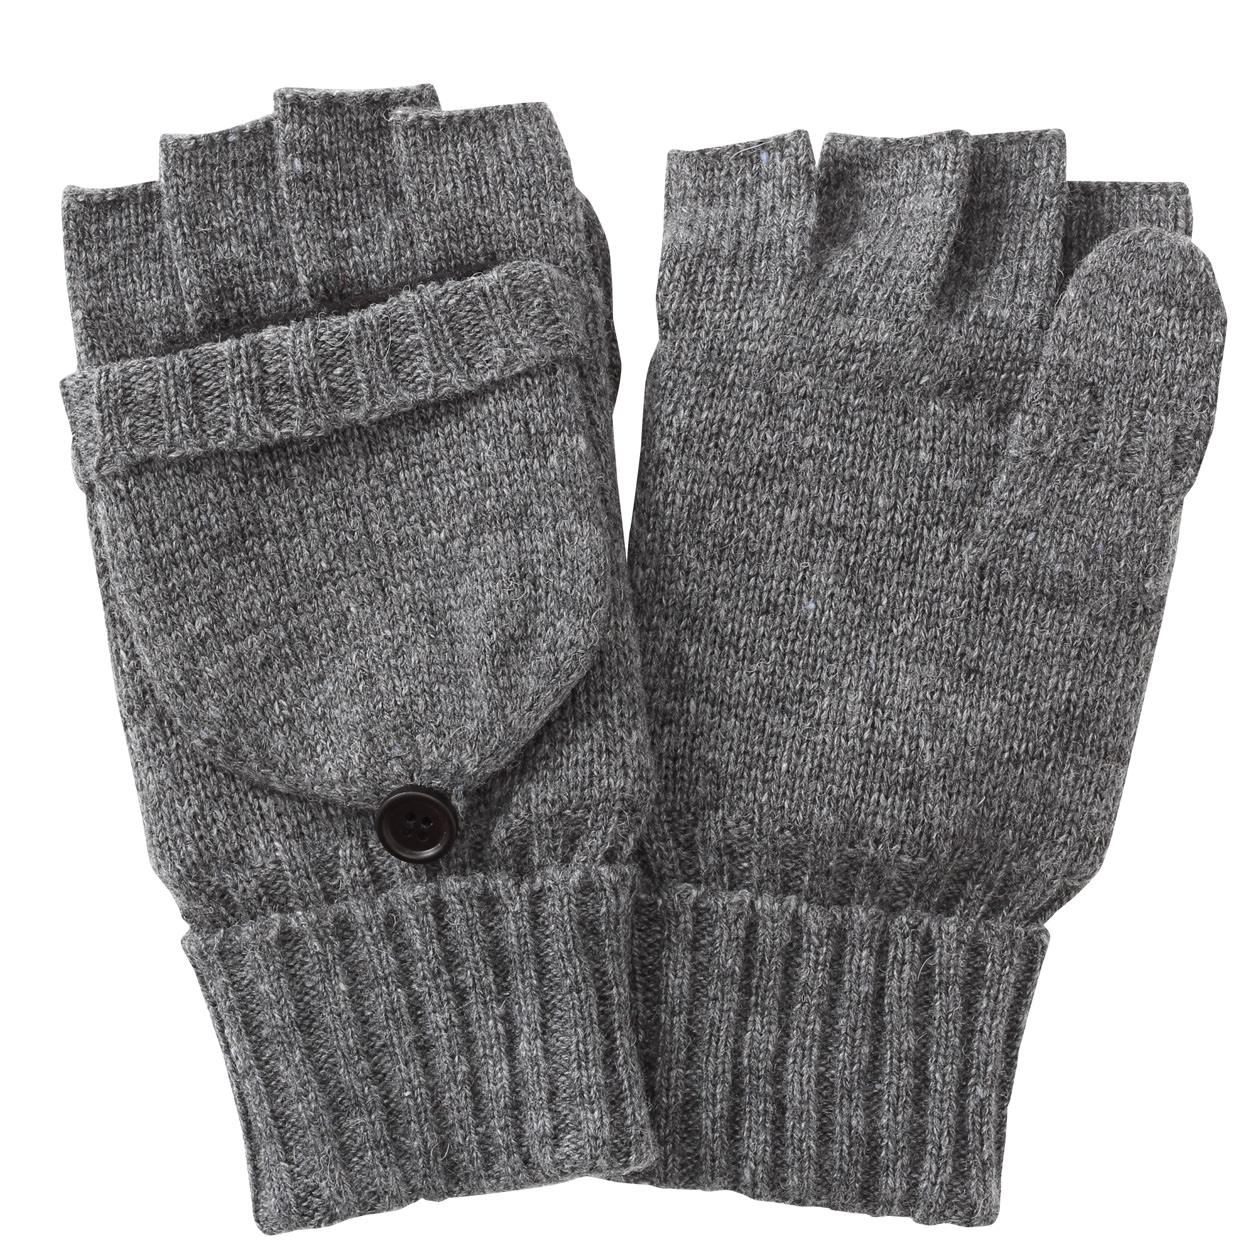 Half Finger Mittens Glove U.P. $29 (Less 10%)